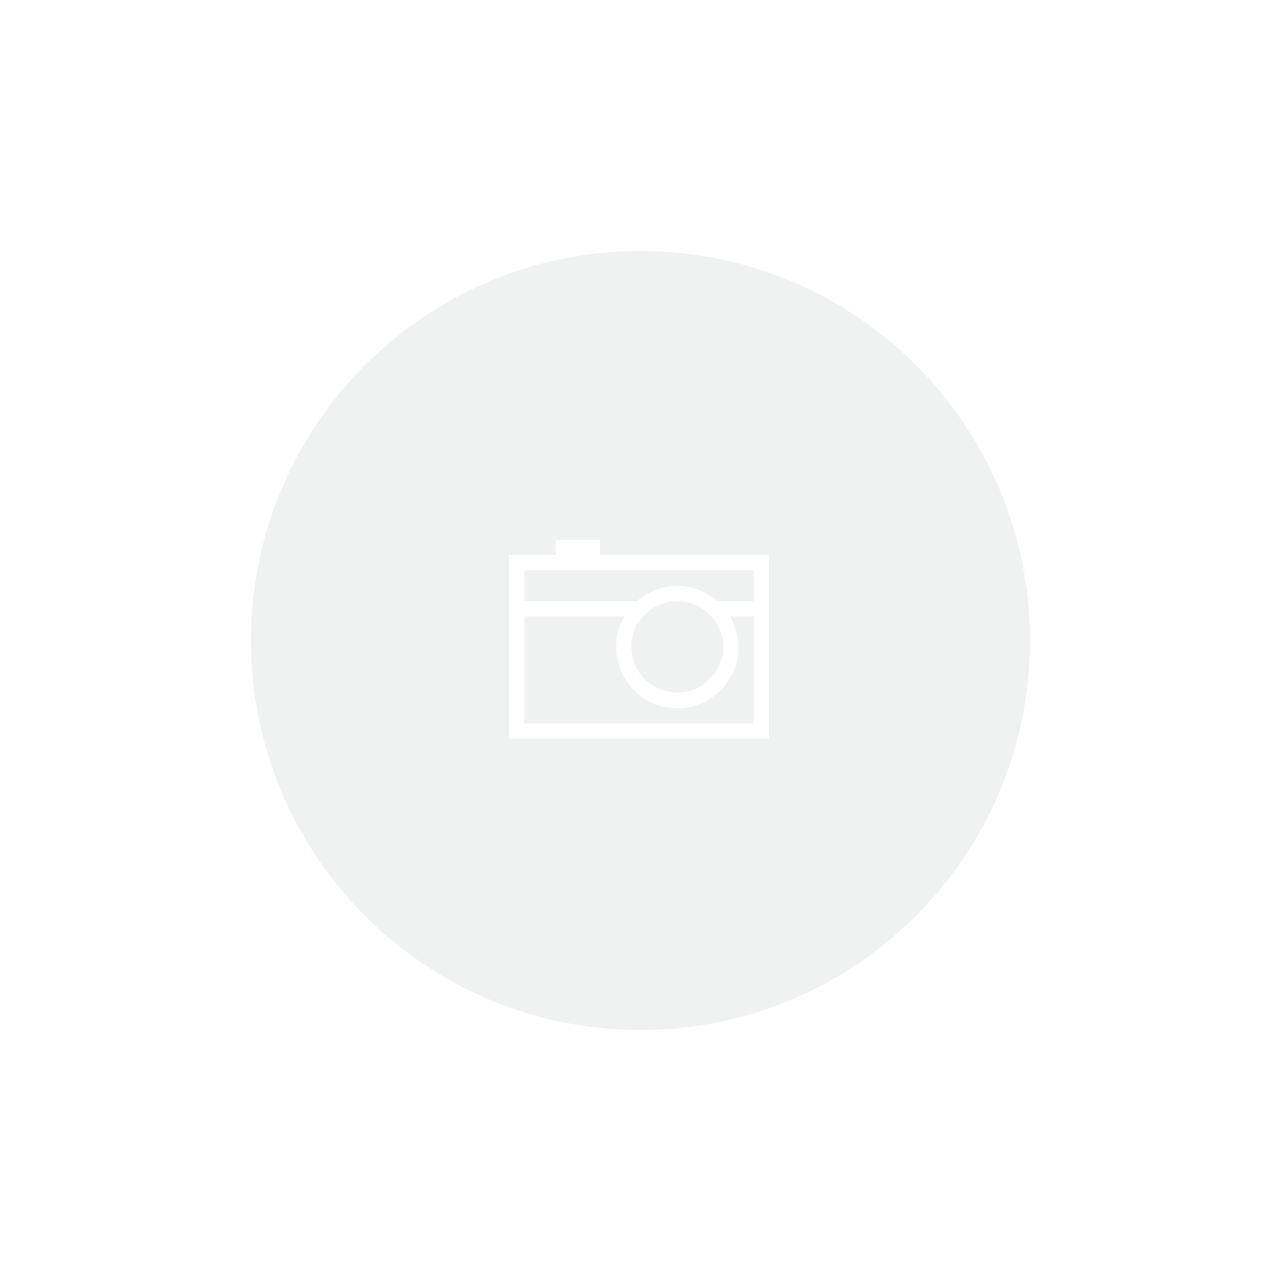 COROA 34D ICTUS NARROW WIDE BCD 94/96mm 4 FUROS (12V)